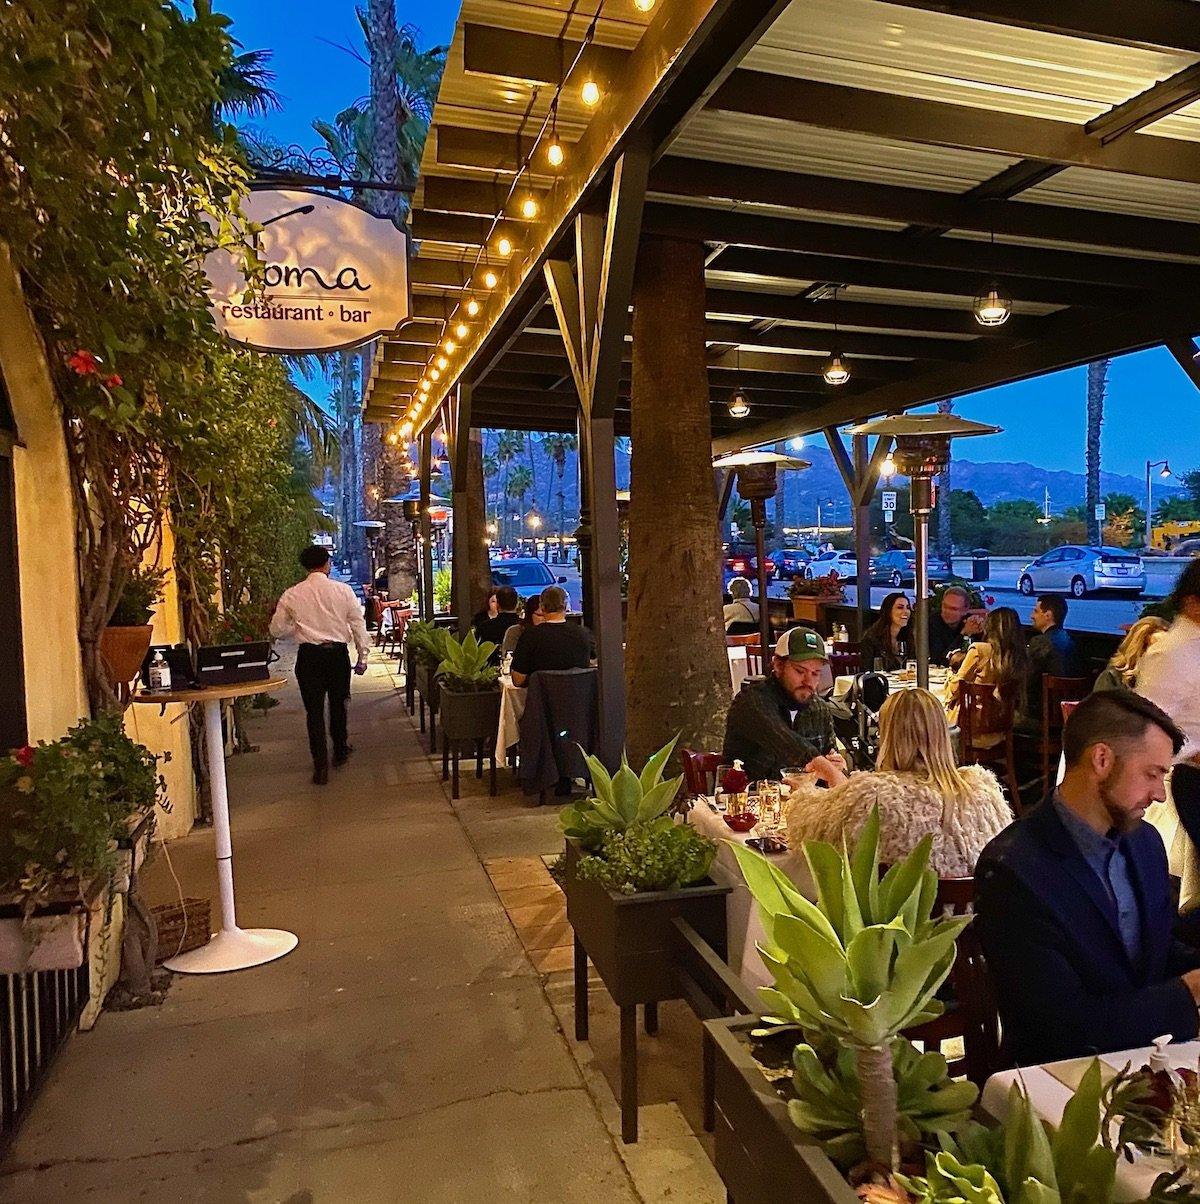 Toma Restaurant exterior, Santa Barbara, California.